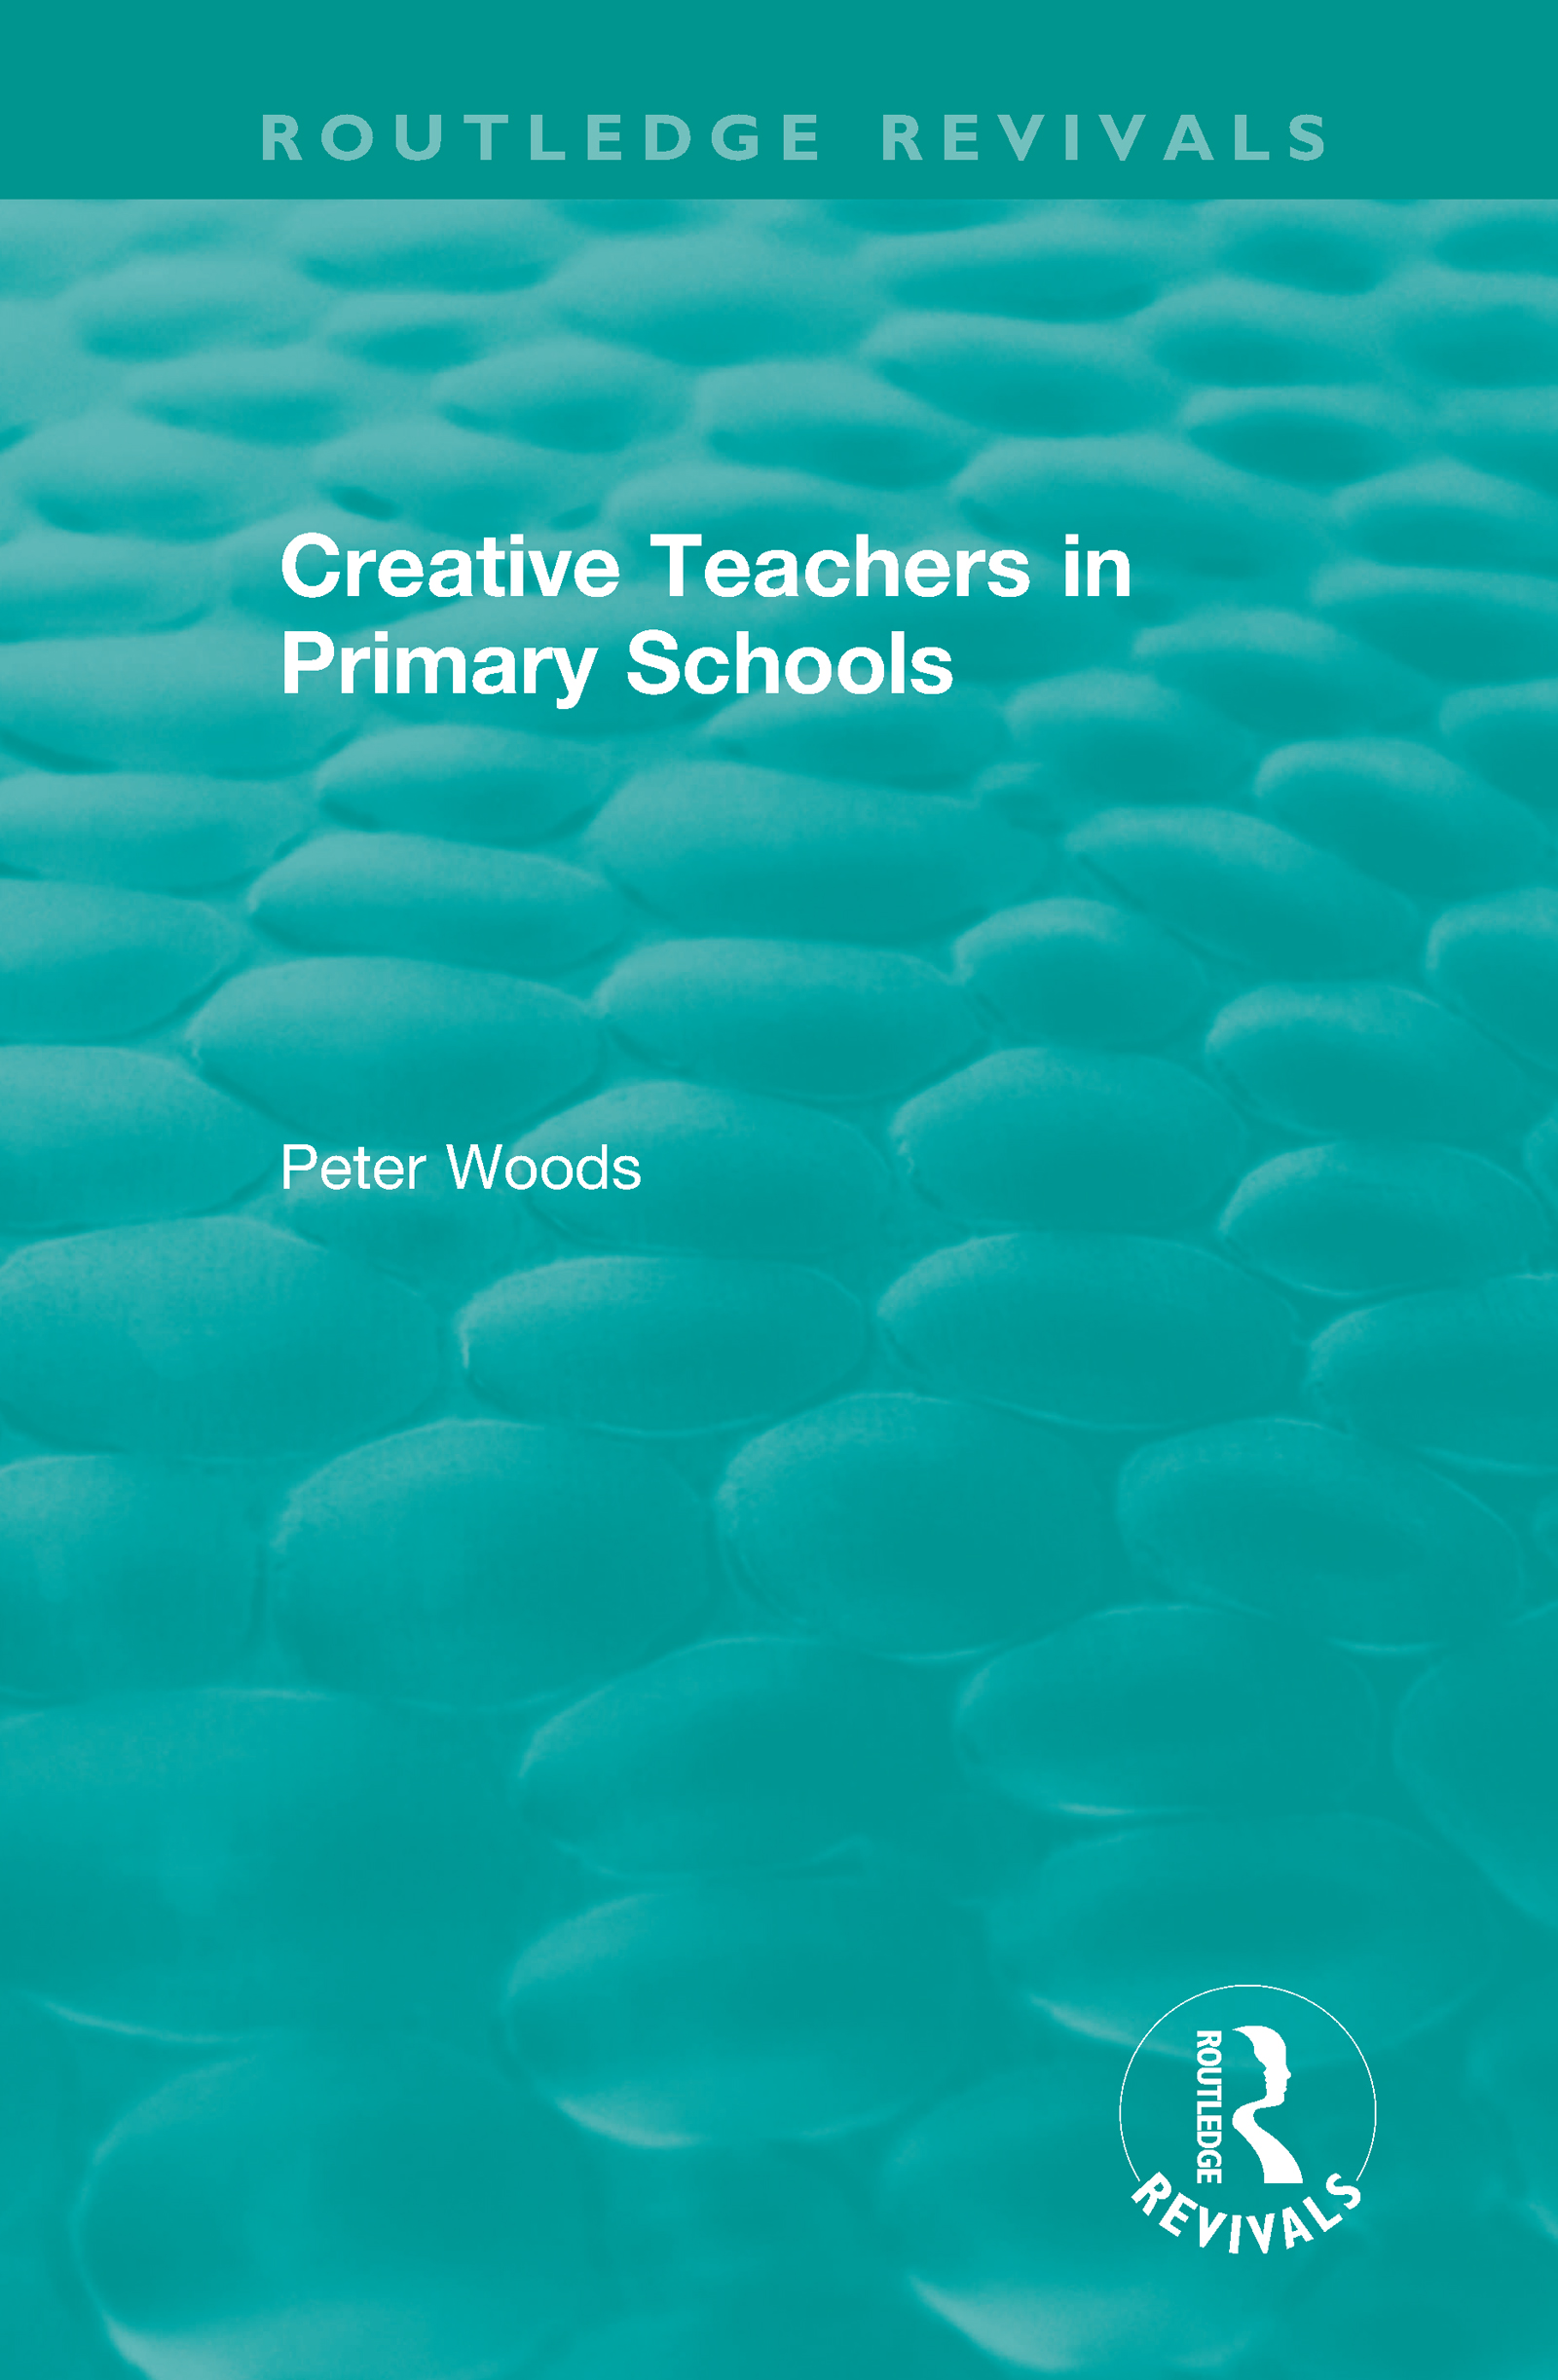 Creative Teachers in Primary Schools